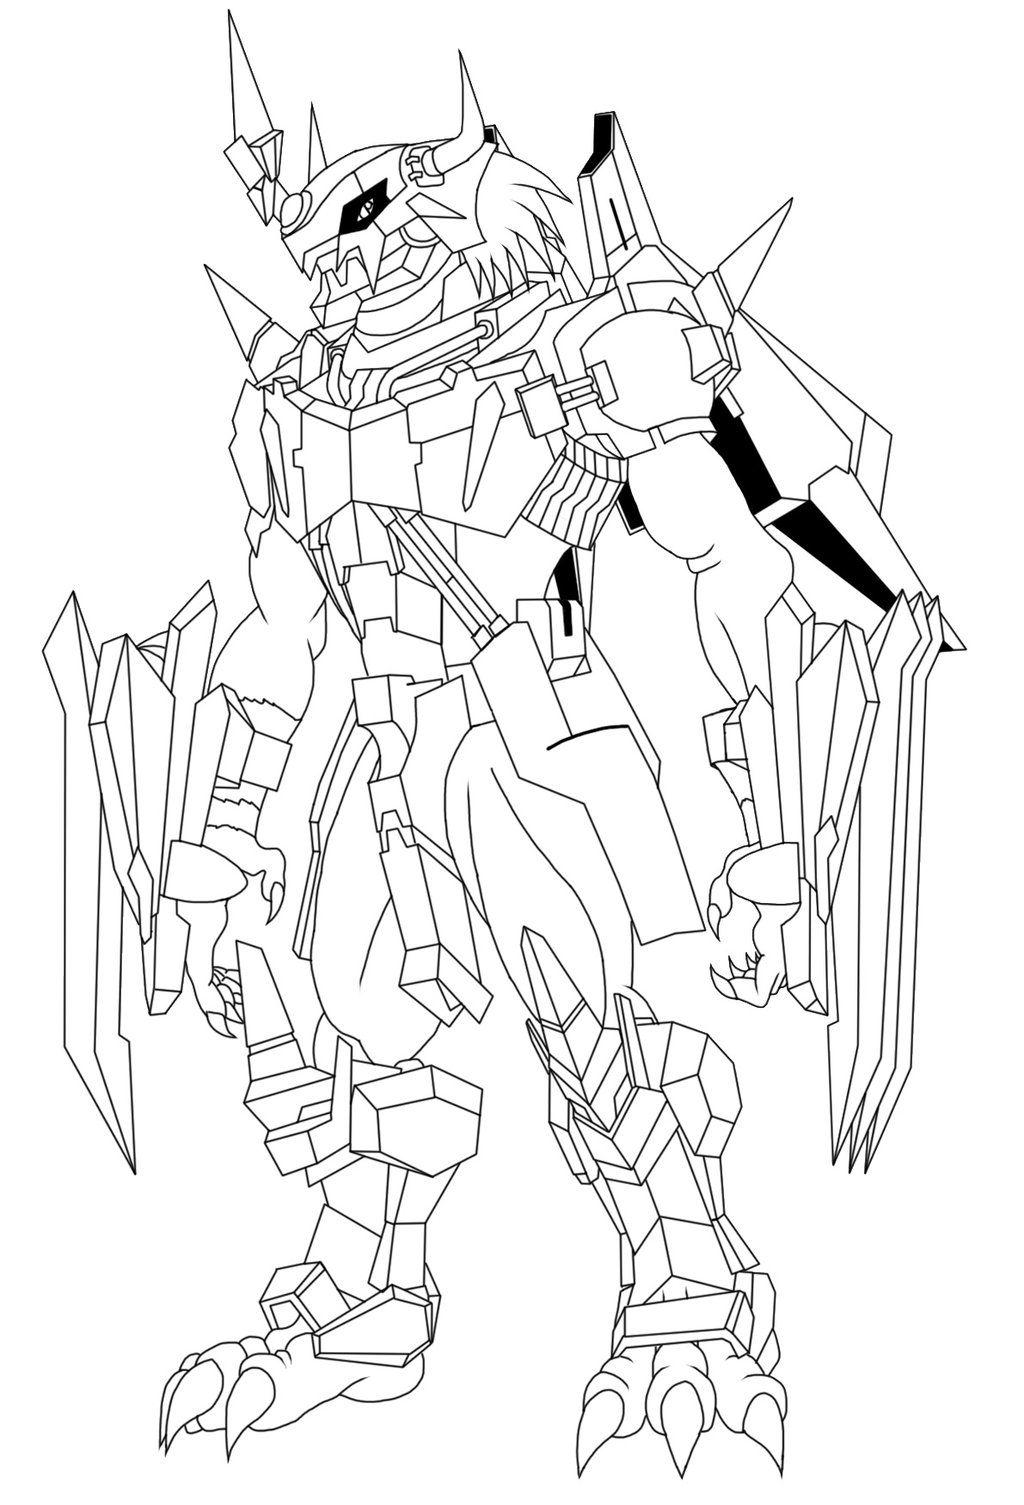 X Antibody Wargreymon Line Art By Pyrus Leonidas Art Line Art Digimon